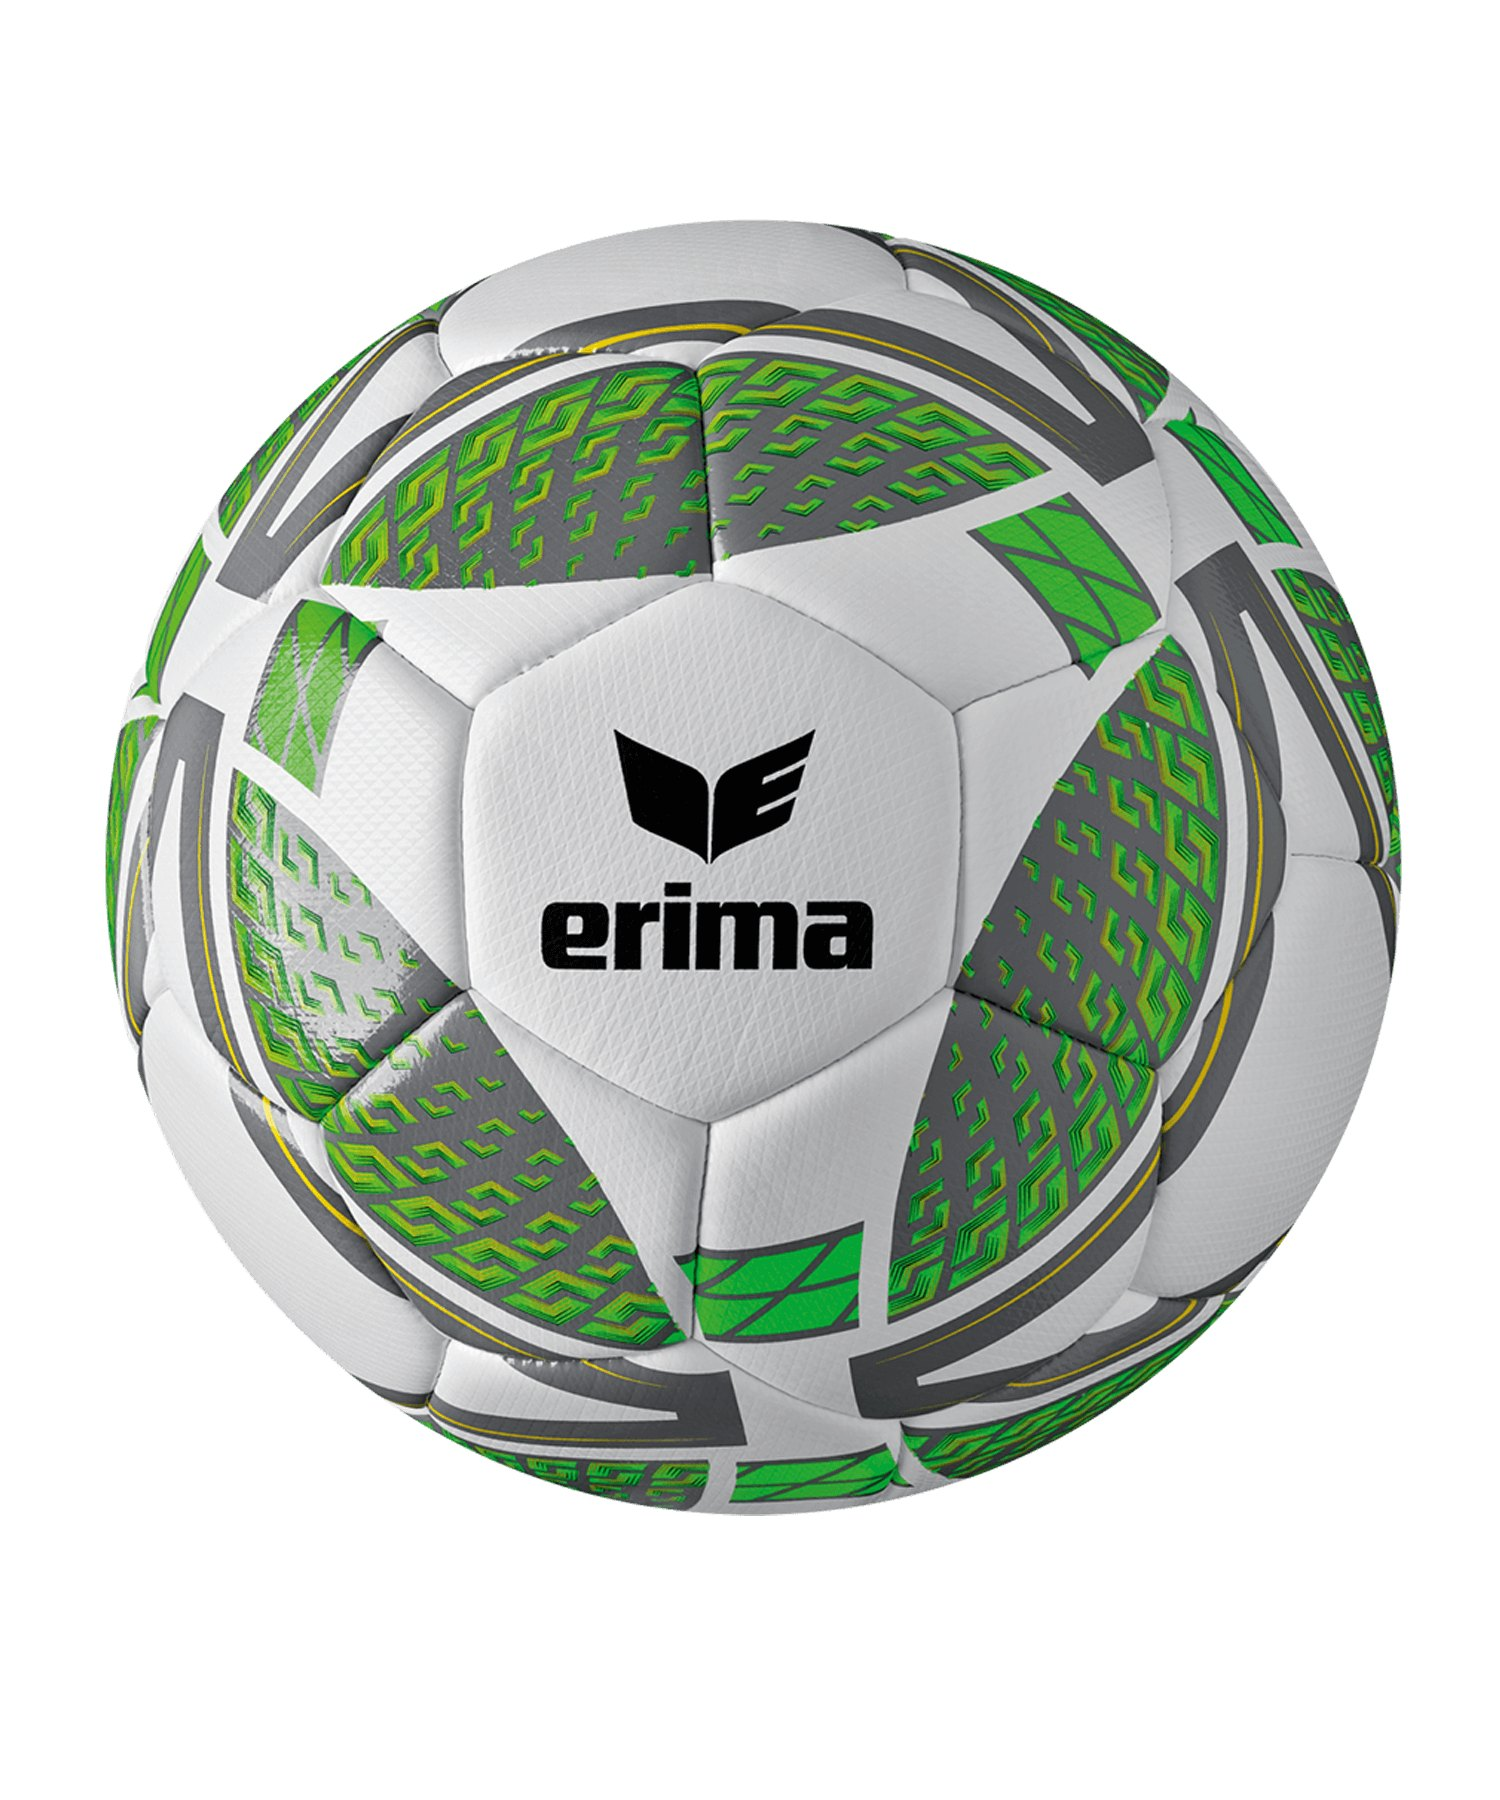 Erima Senzor Lightball 350 Gramm Gr. 5 Grau Grün - grau